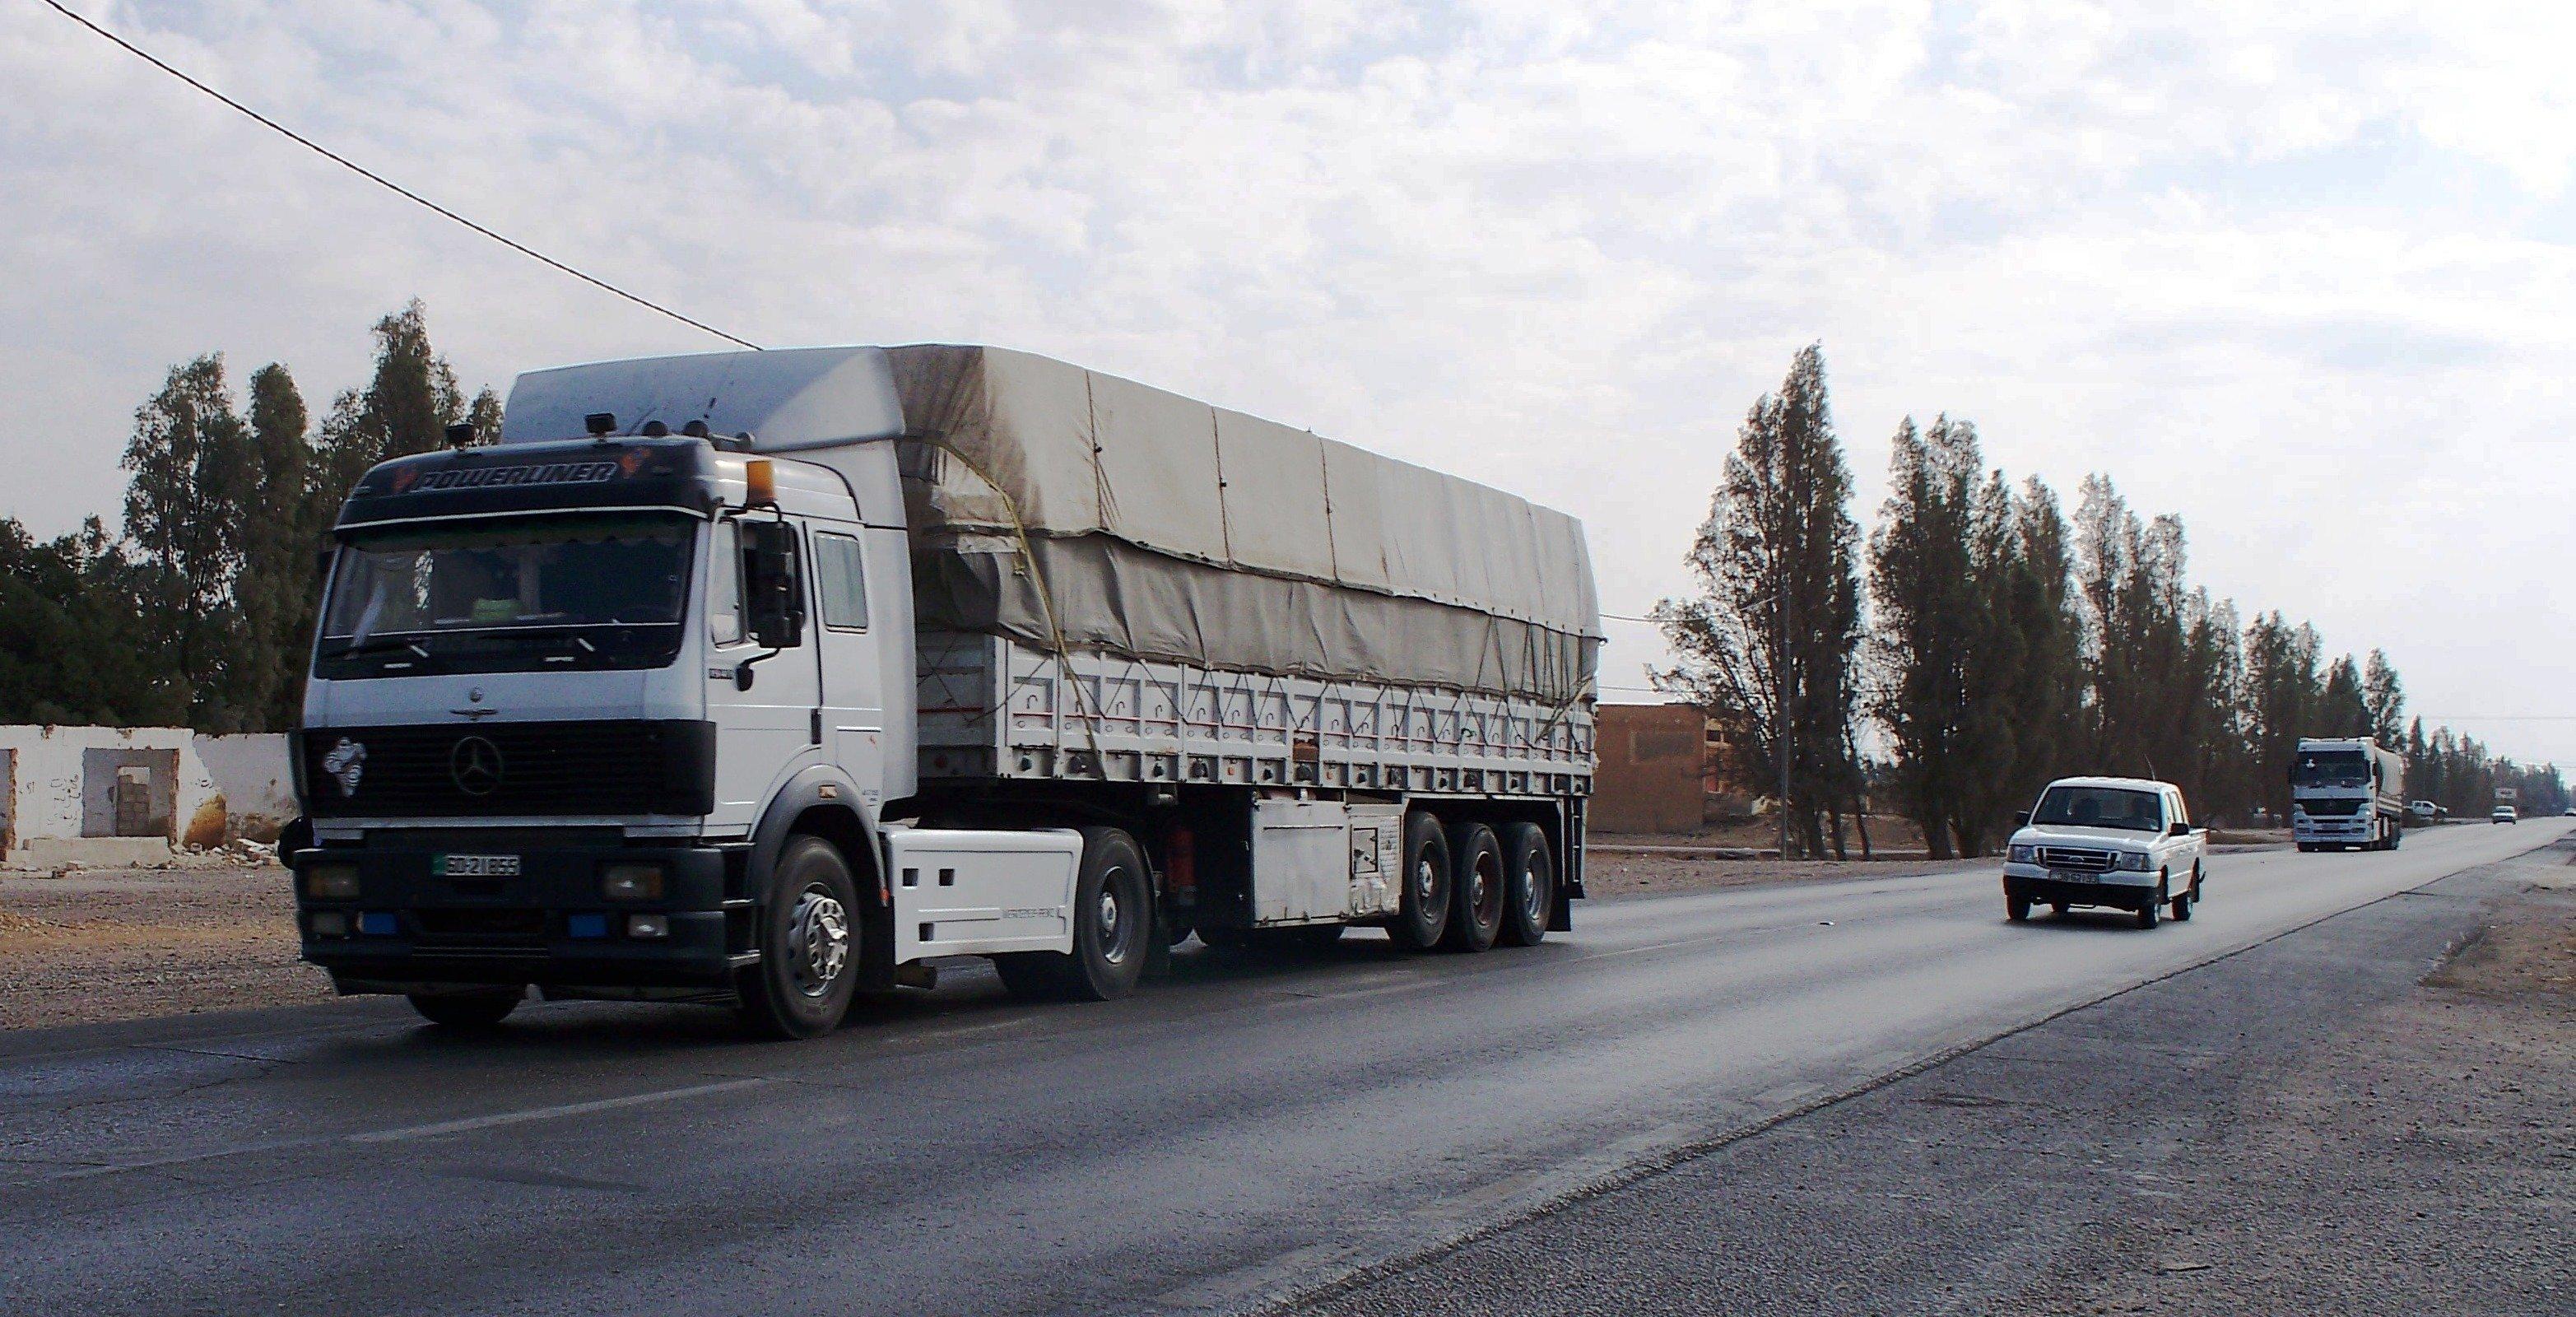 Camión en carretera. | Imagen: Wikimedia Commons